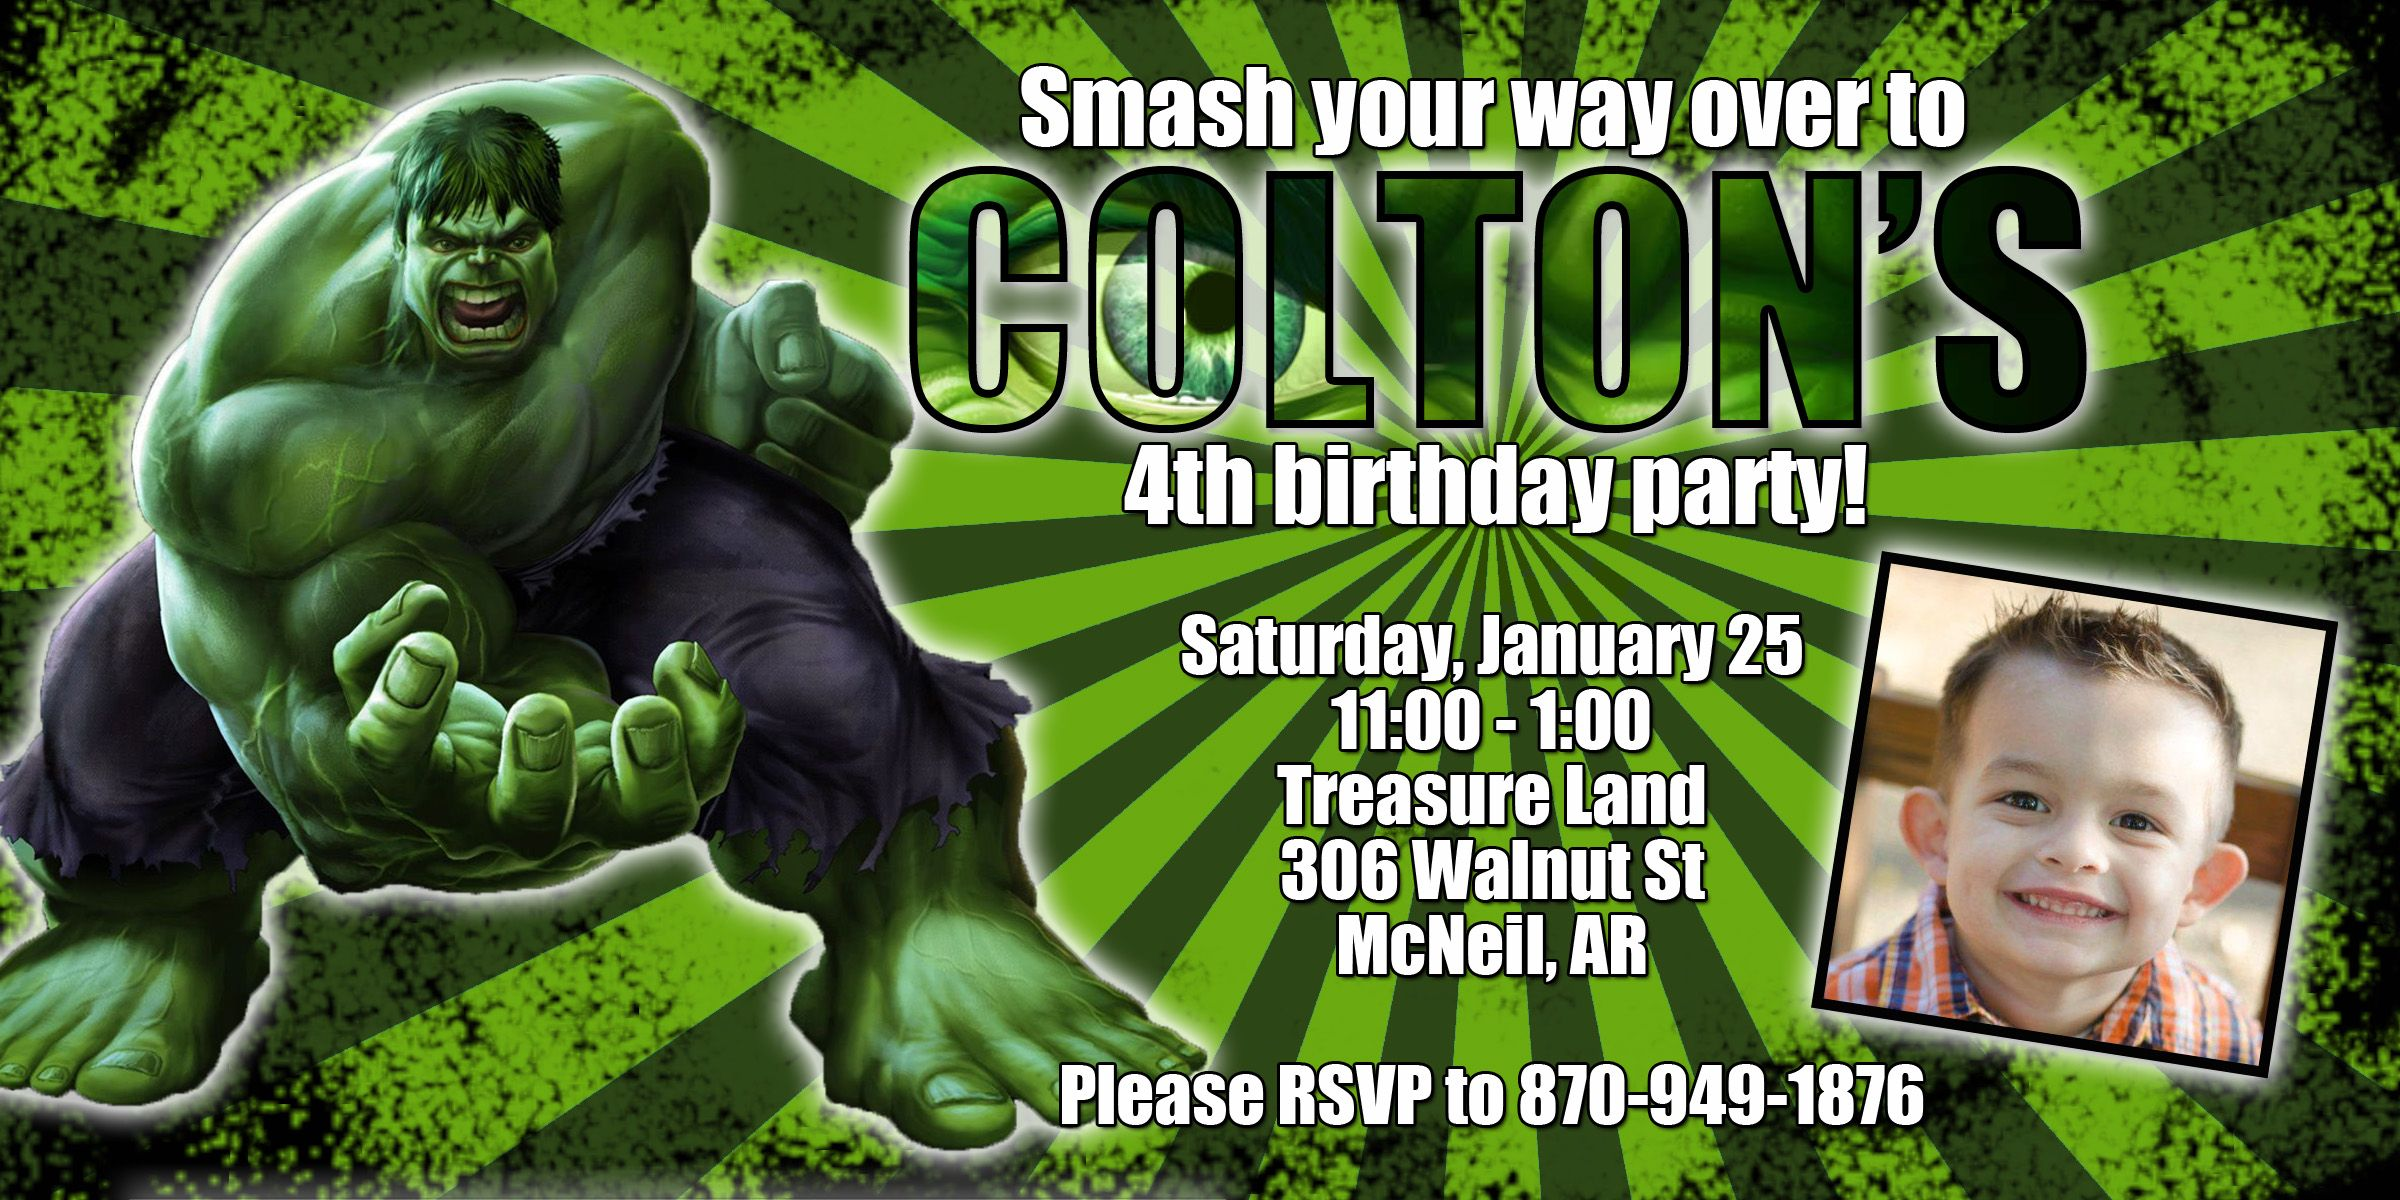 Hulk Birthday Party Invitation With